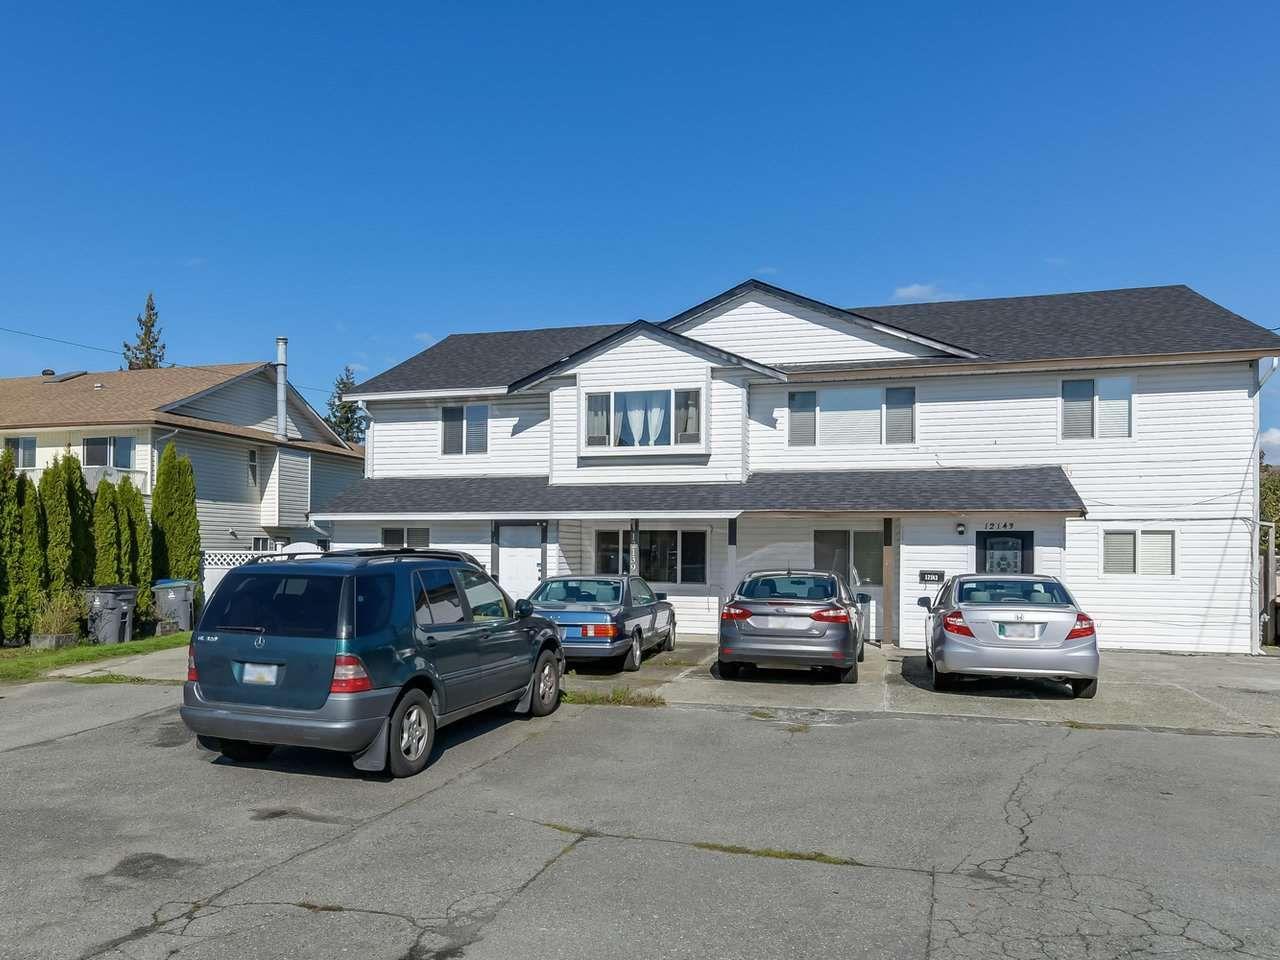 Main Photo: 12139 98 Avenue in Surrey: Cedar Hills House 1/2 Duplex for sale (North Surrey)  : MLS®# R2313874